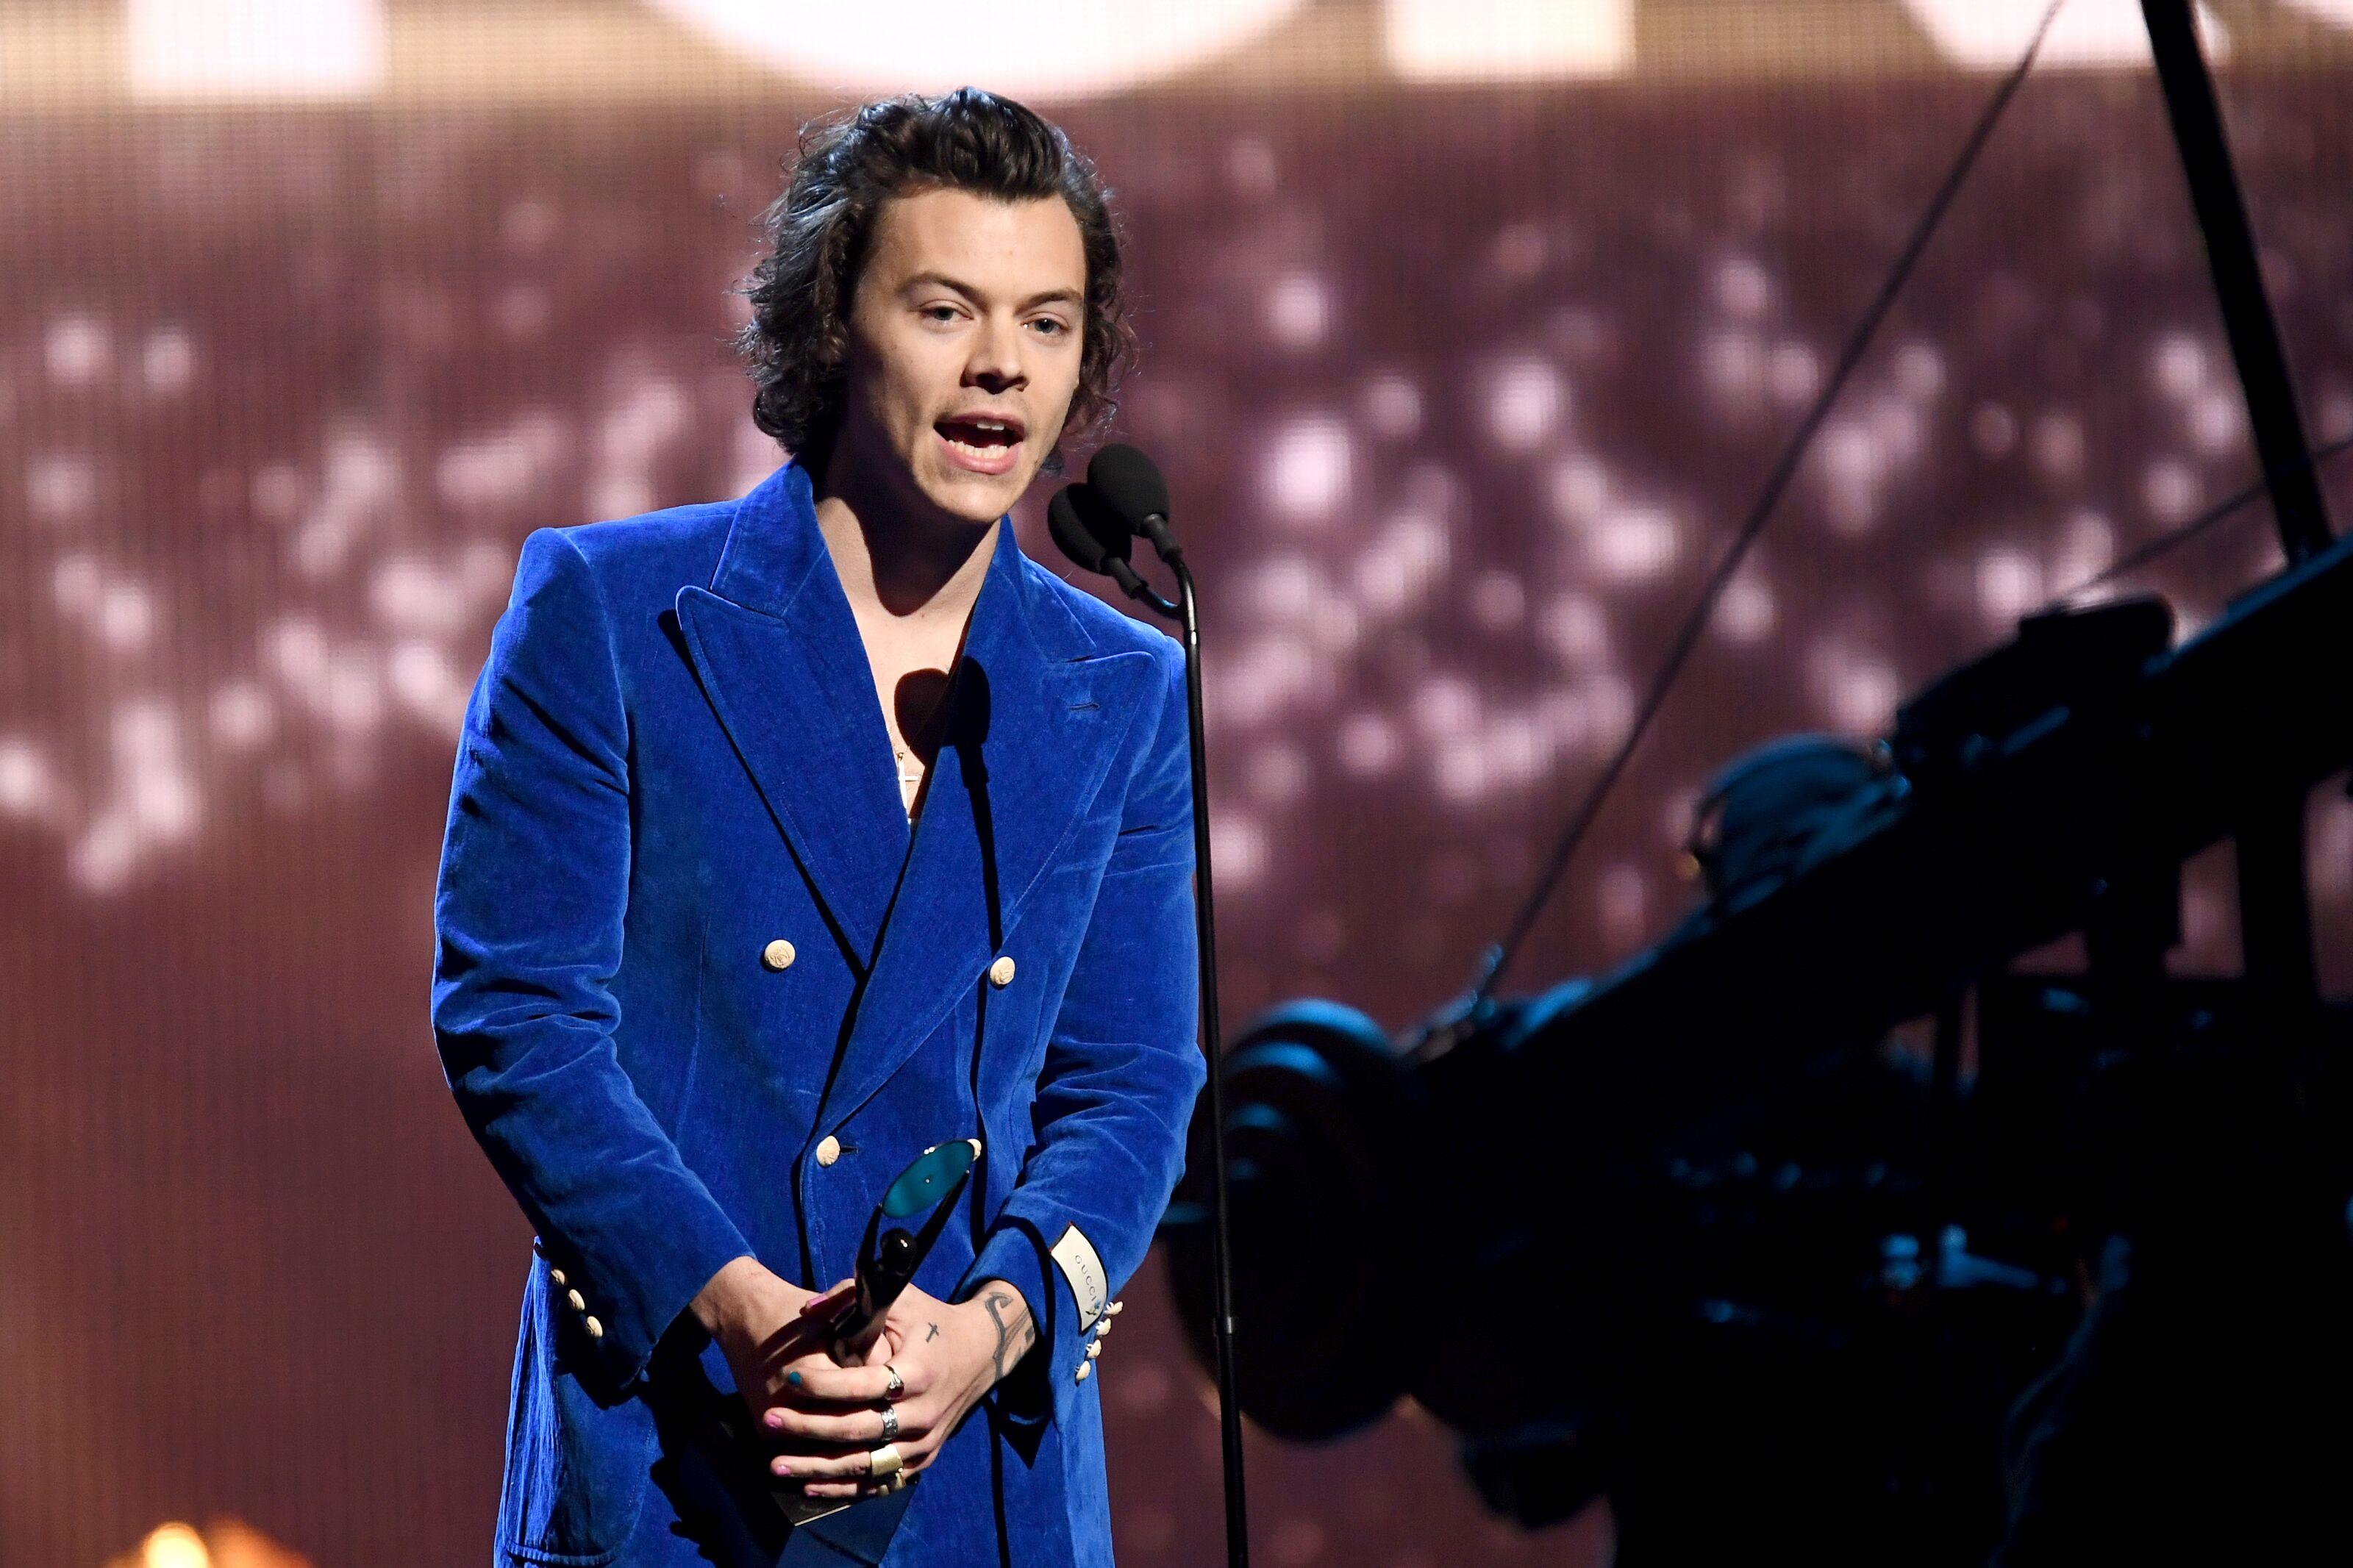 Saturday Night Live: Harry Styles is under pressure